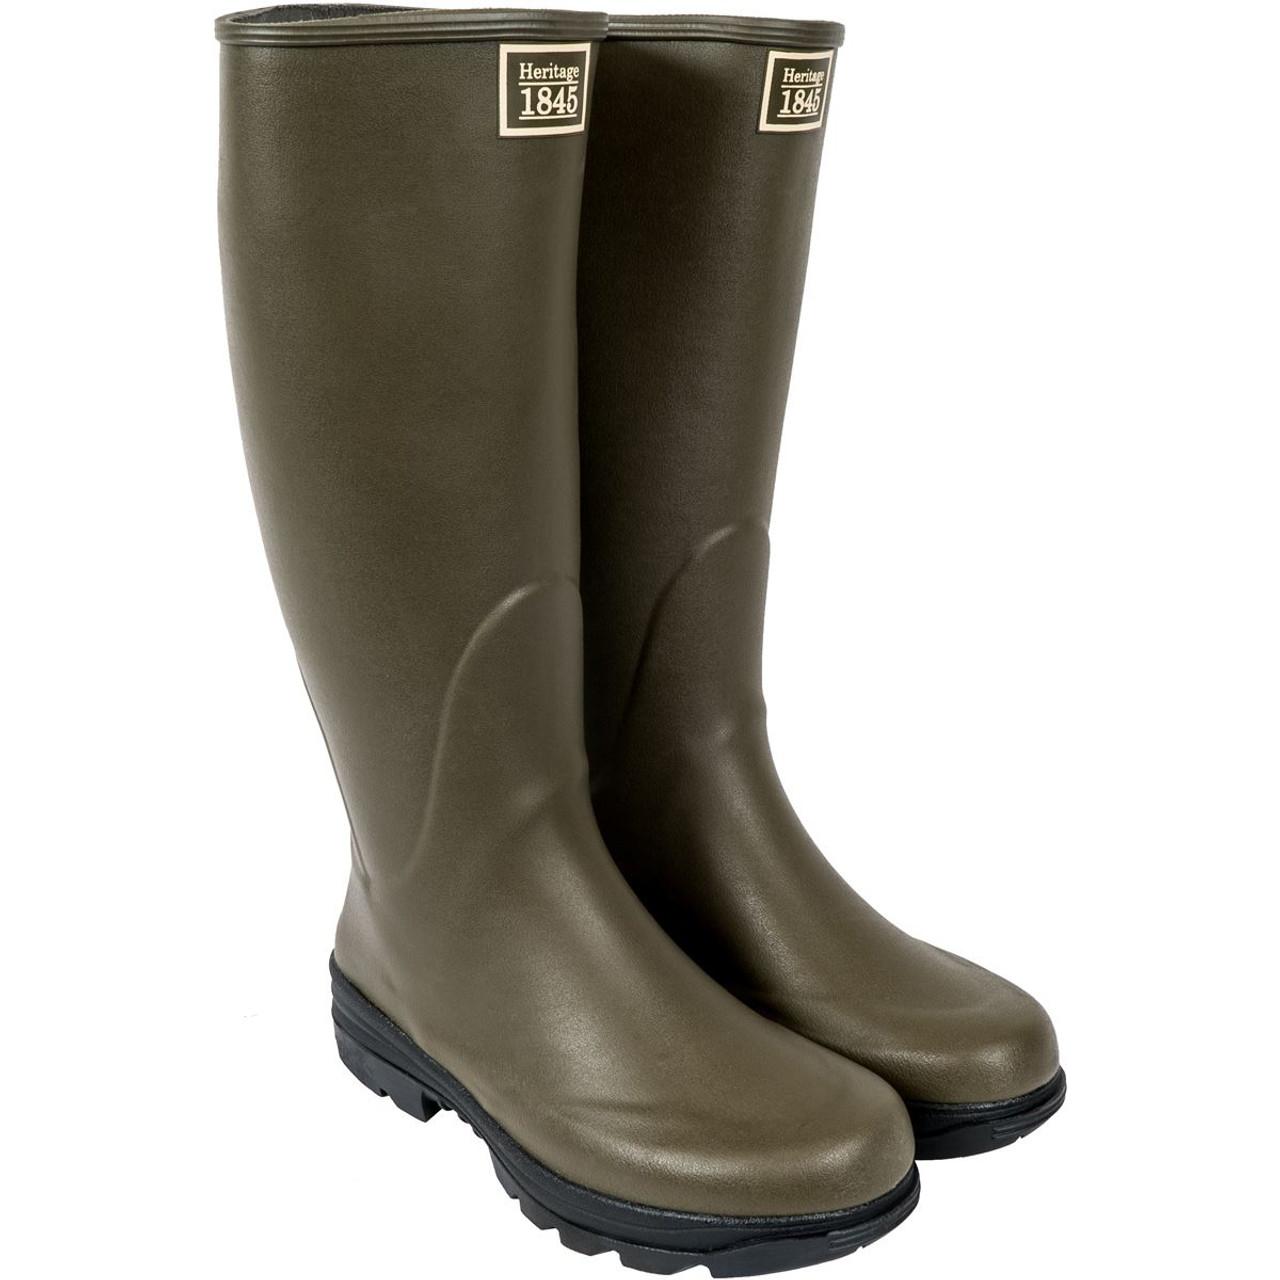 Heritage 1845 Dinedor Wellington Boots